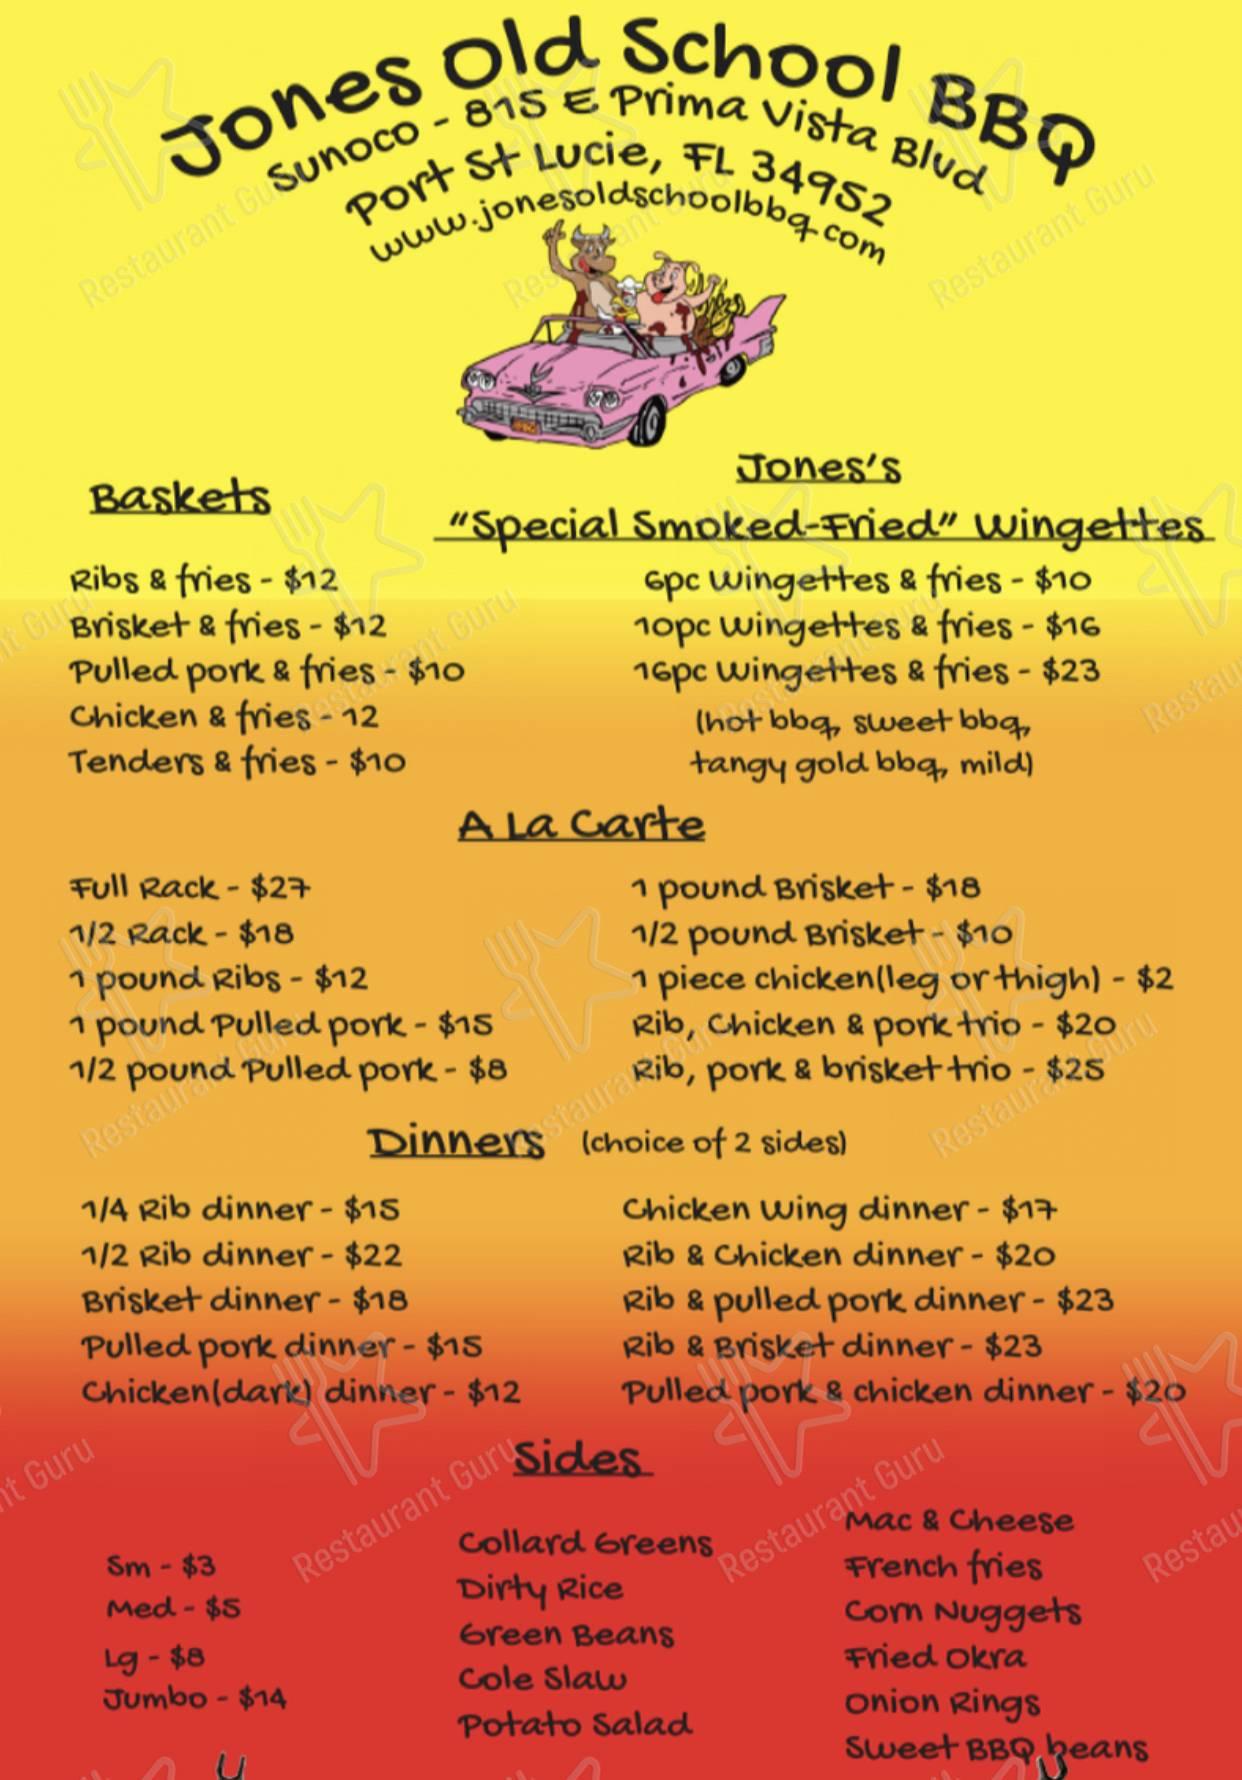 Jones Old School BBQ menu - dishes and beverages